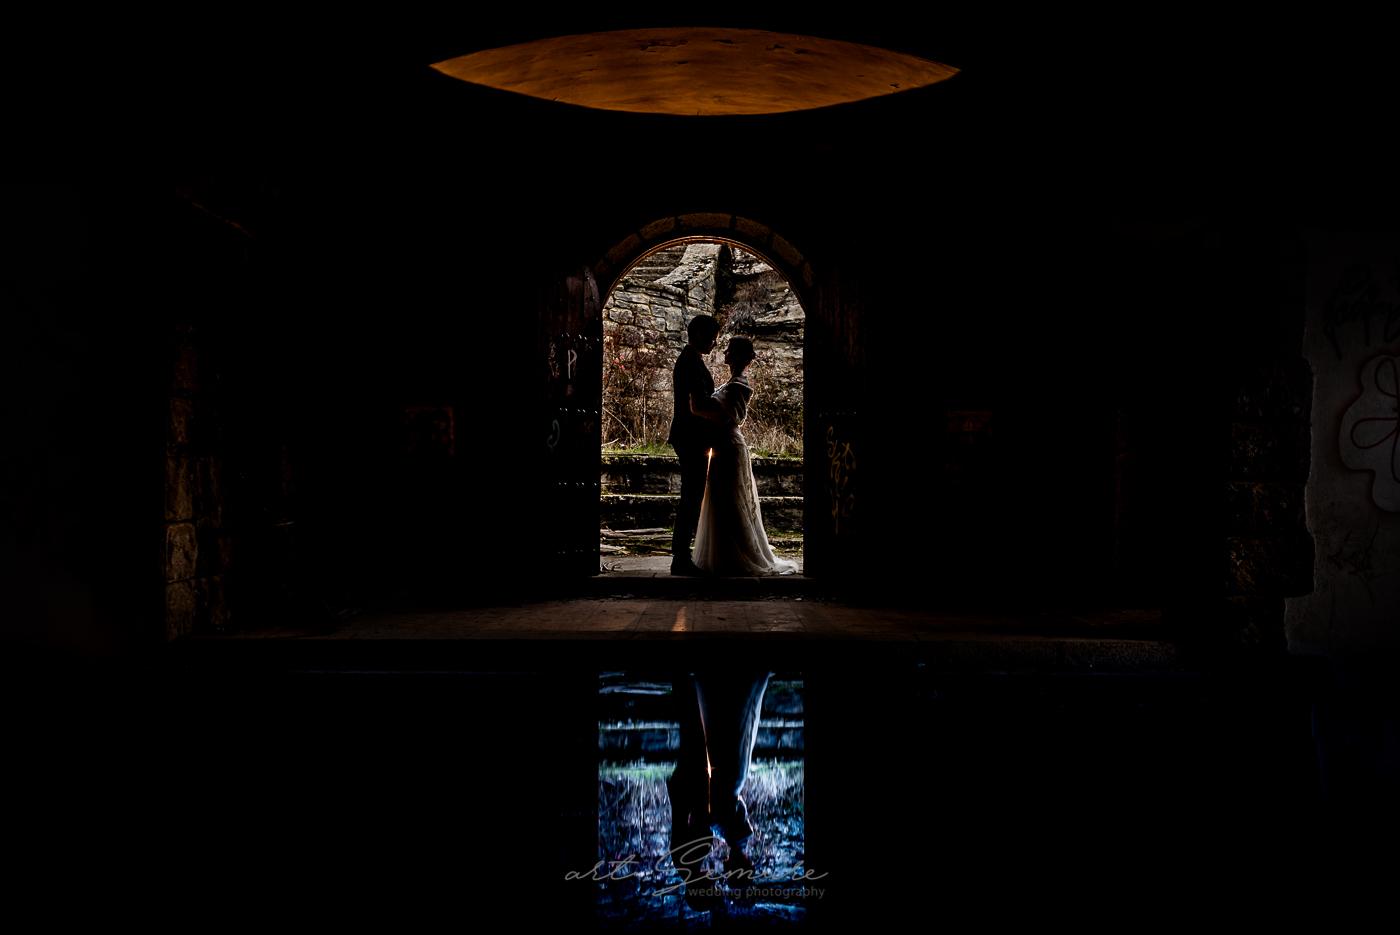 fotografo boda emotiva zamora salto de castro 04_